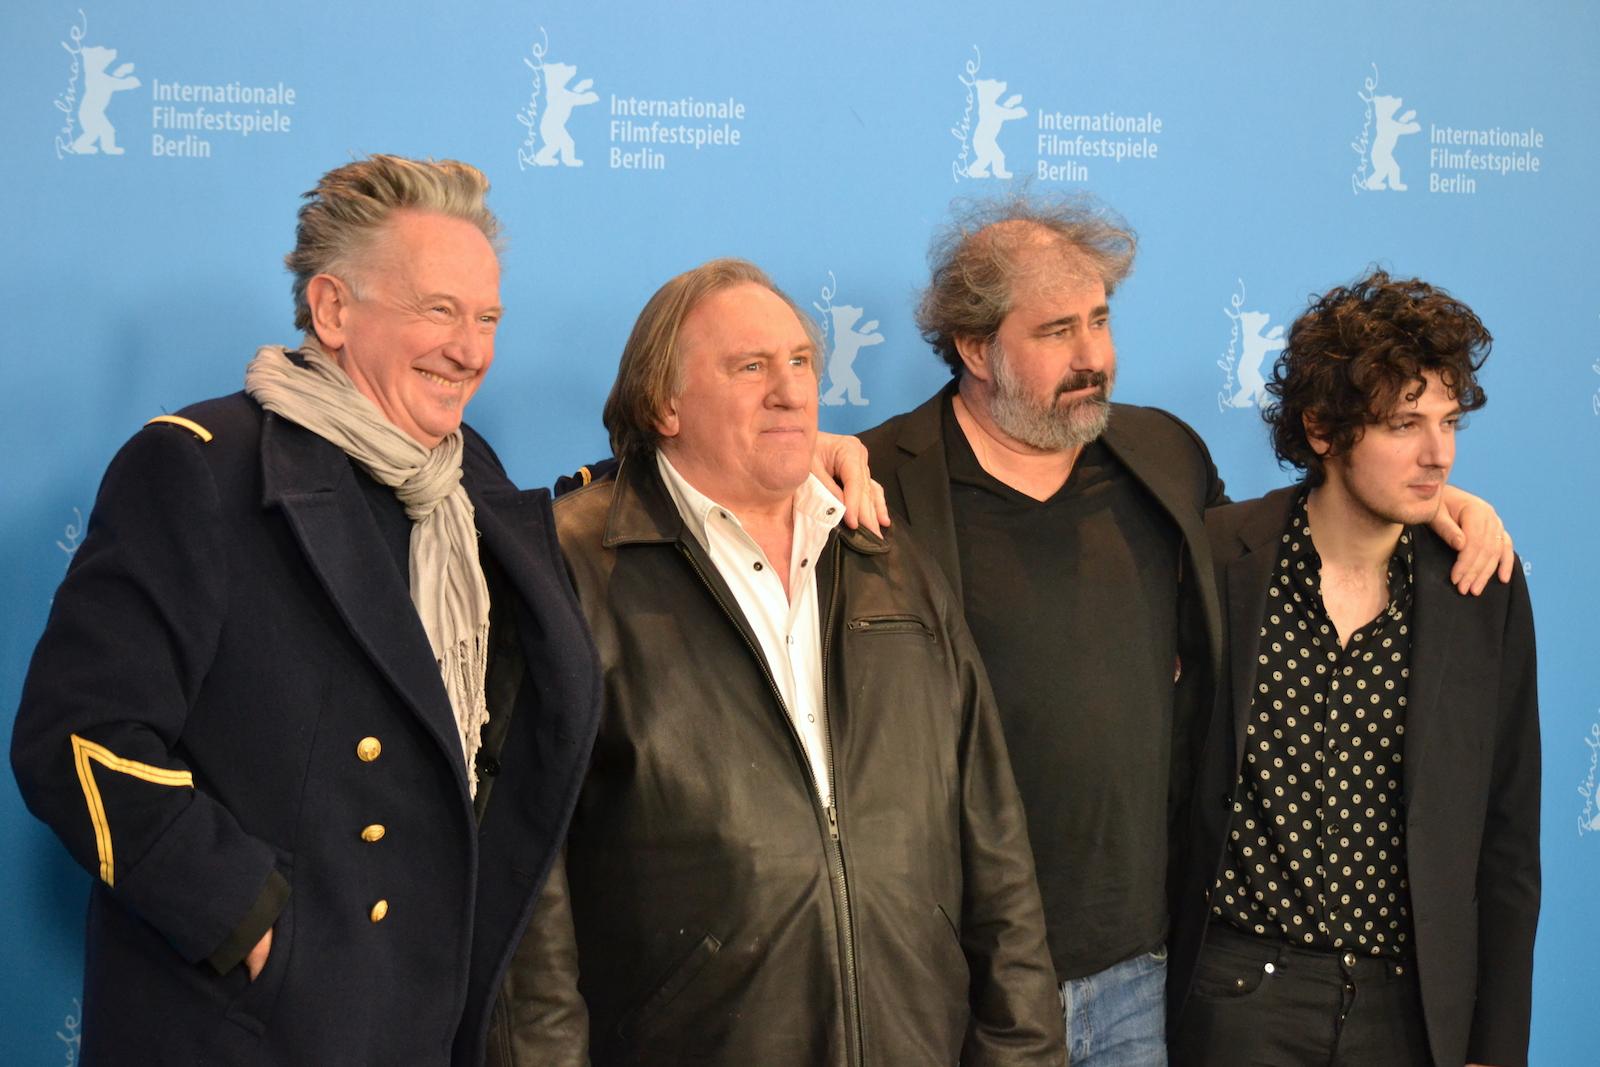 Berlino 2016: Benoît Delépine, Gustave Kervern, Gérard Depardieu, Vincent Lacoste in uno scatto al photocall di Saint Amour